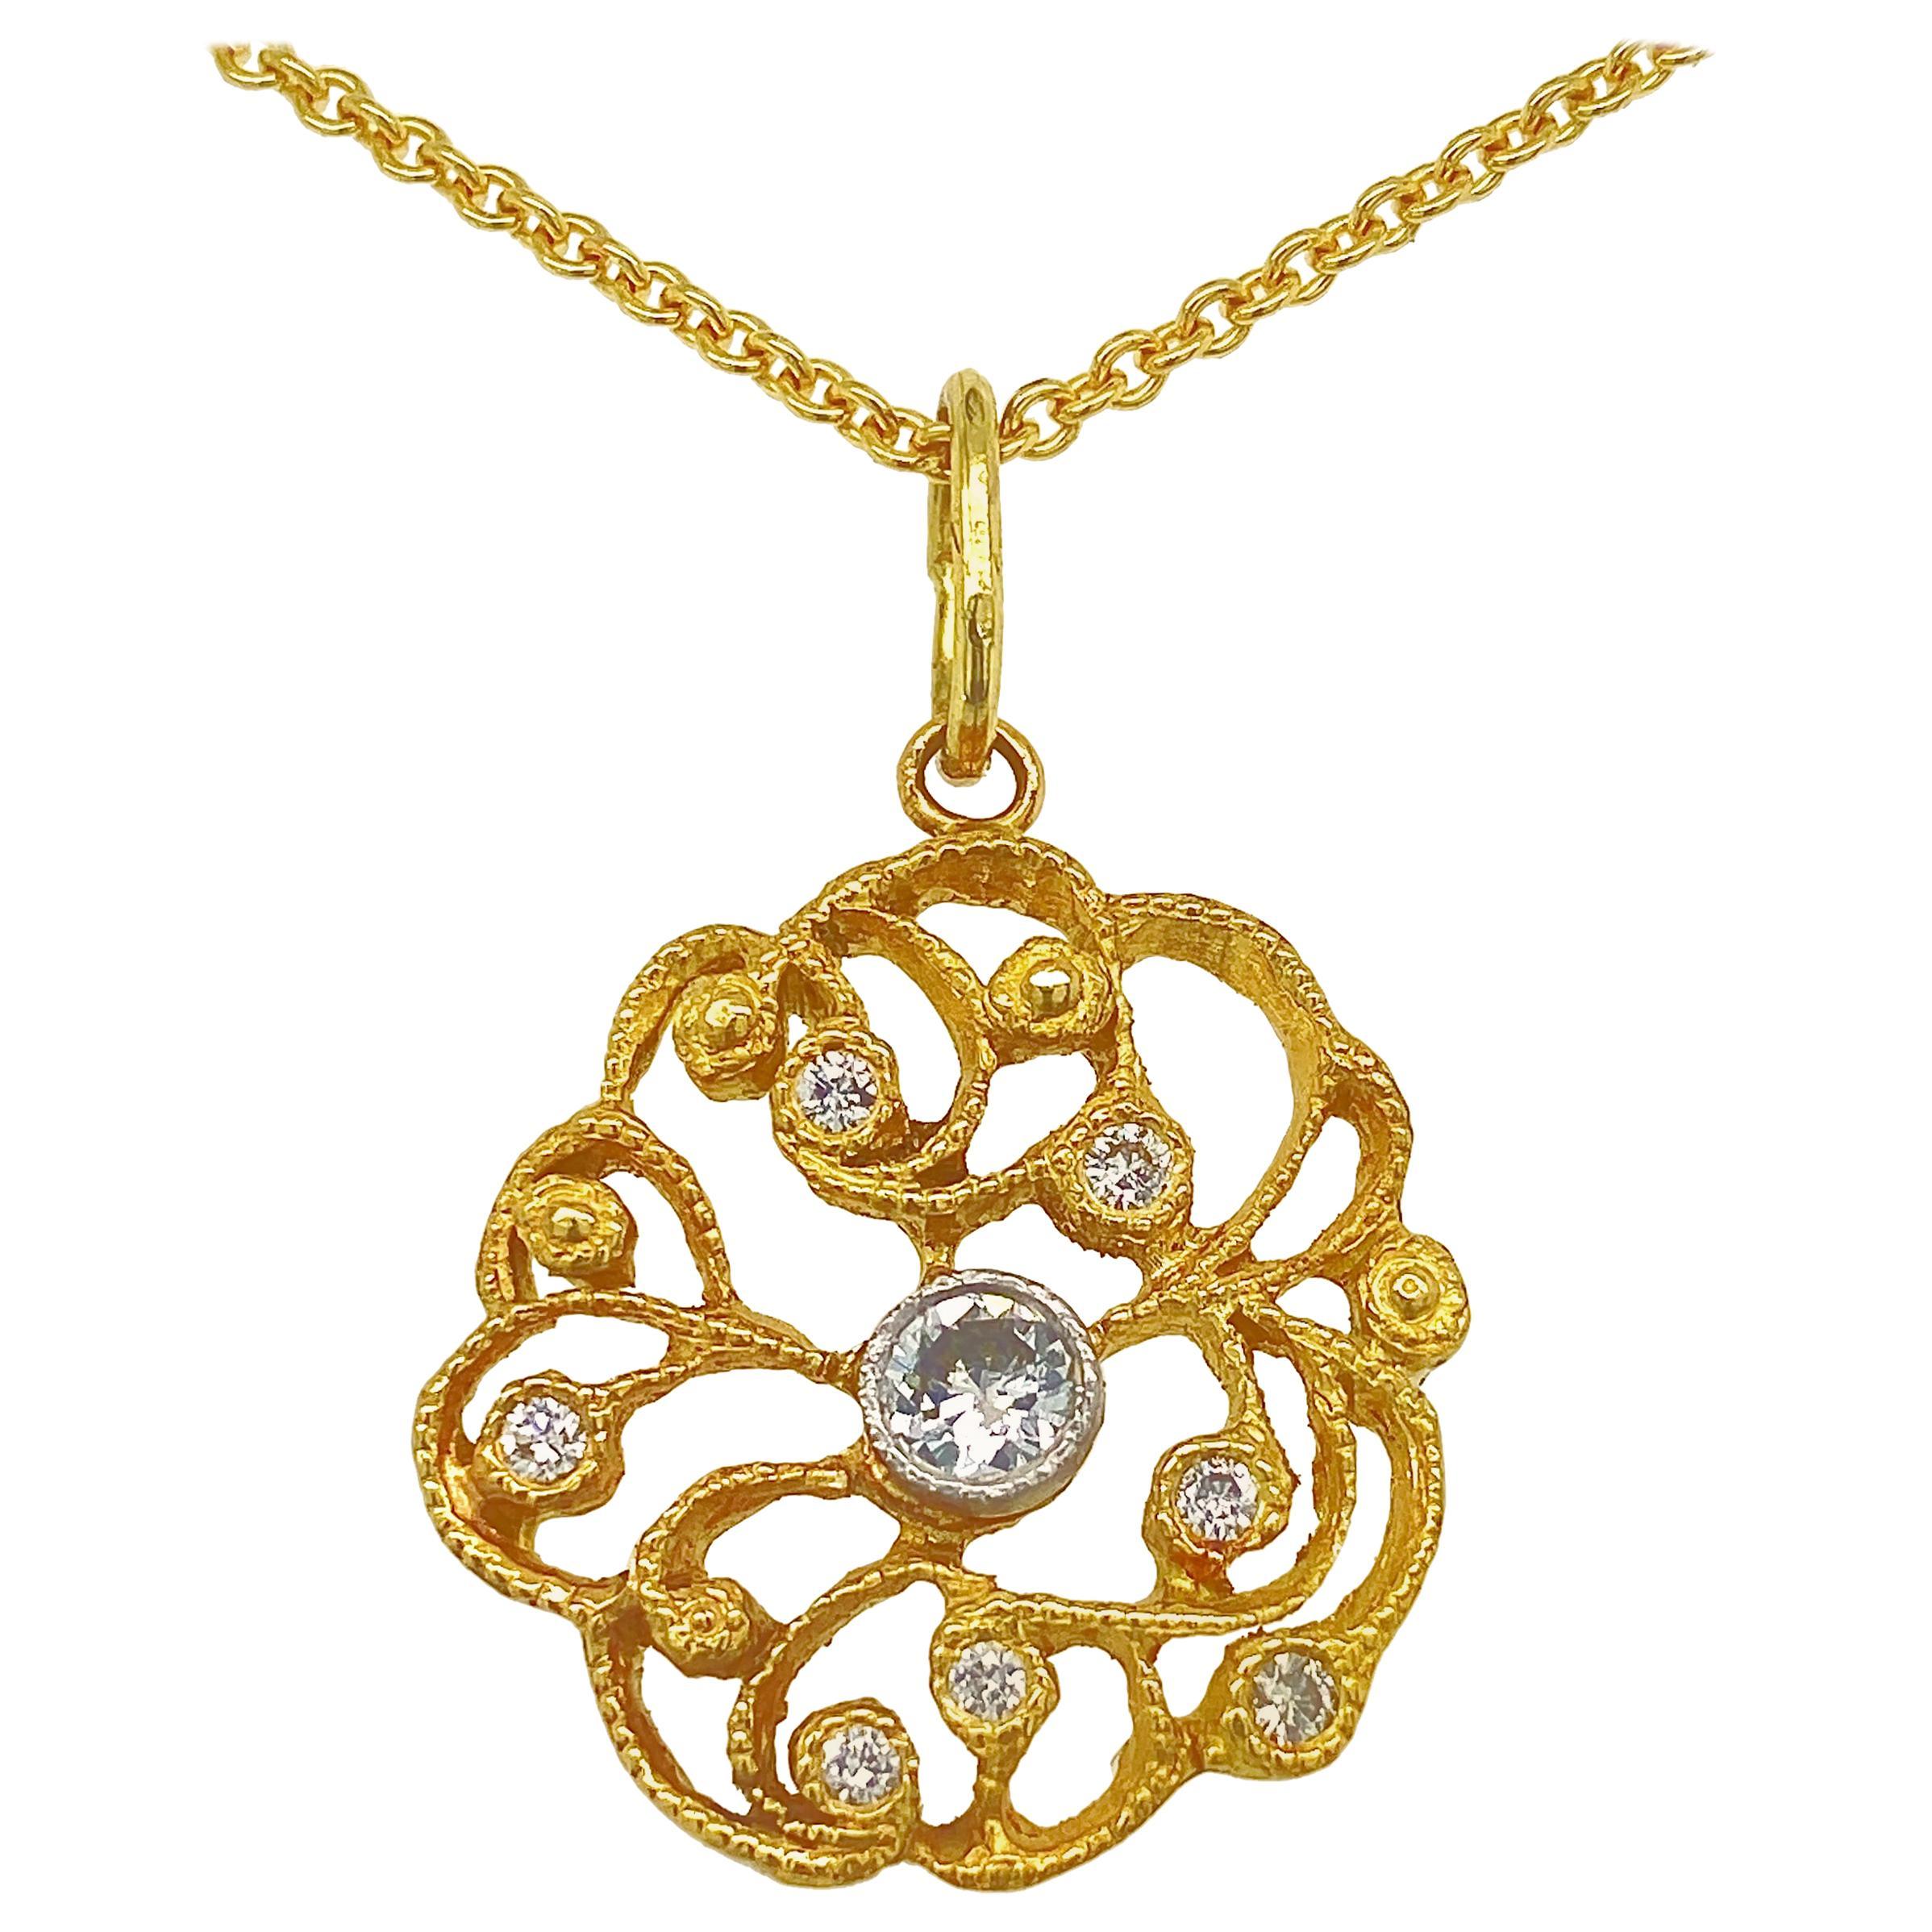 """Doily"" Diamond Rondelle Pendant on Chain, All in 18 Karat Gold"